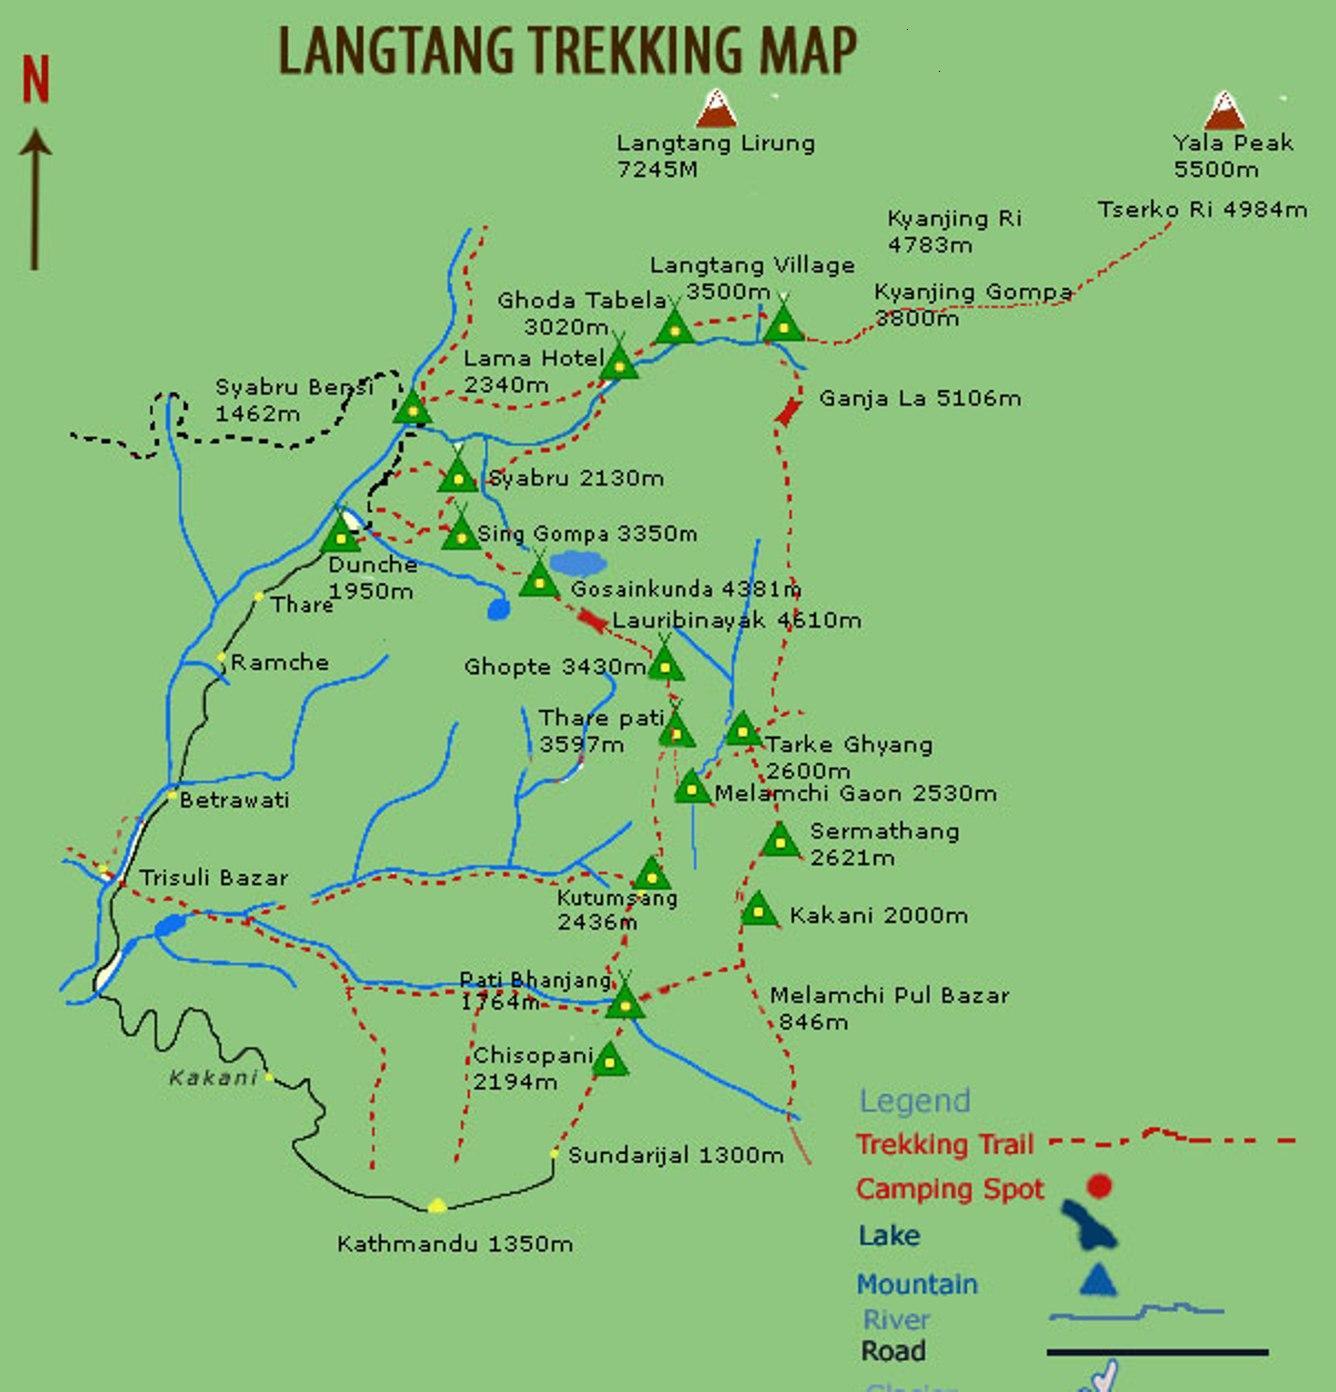 Langtang Valley Trekking Map